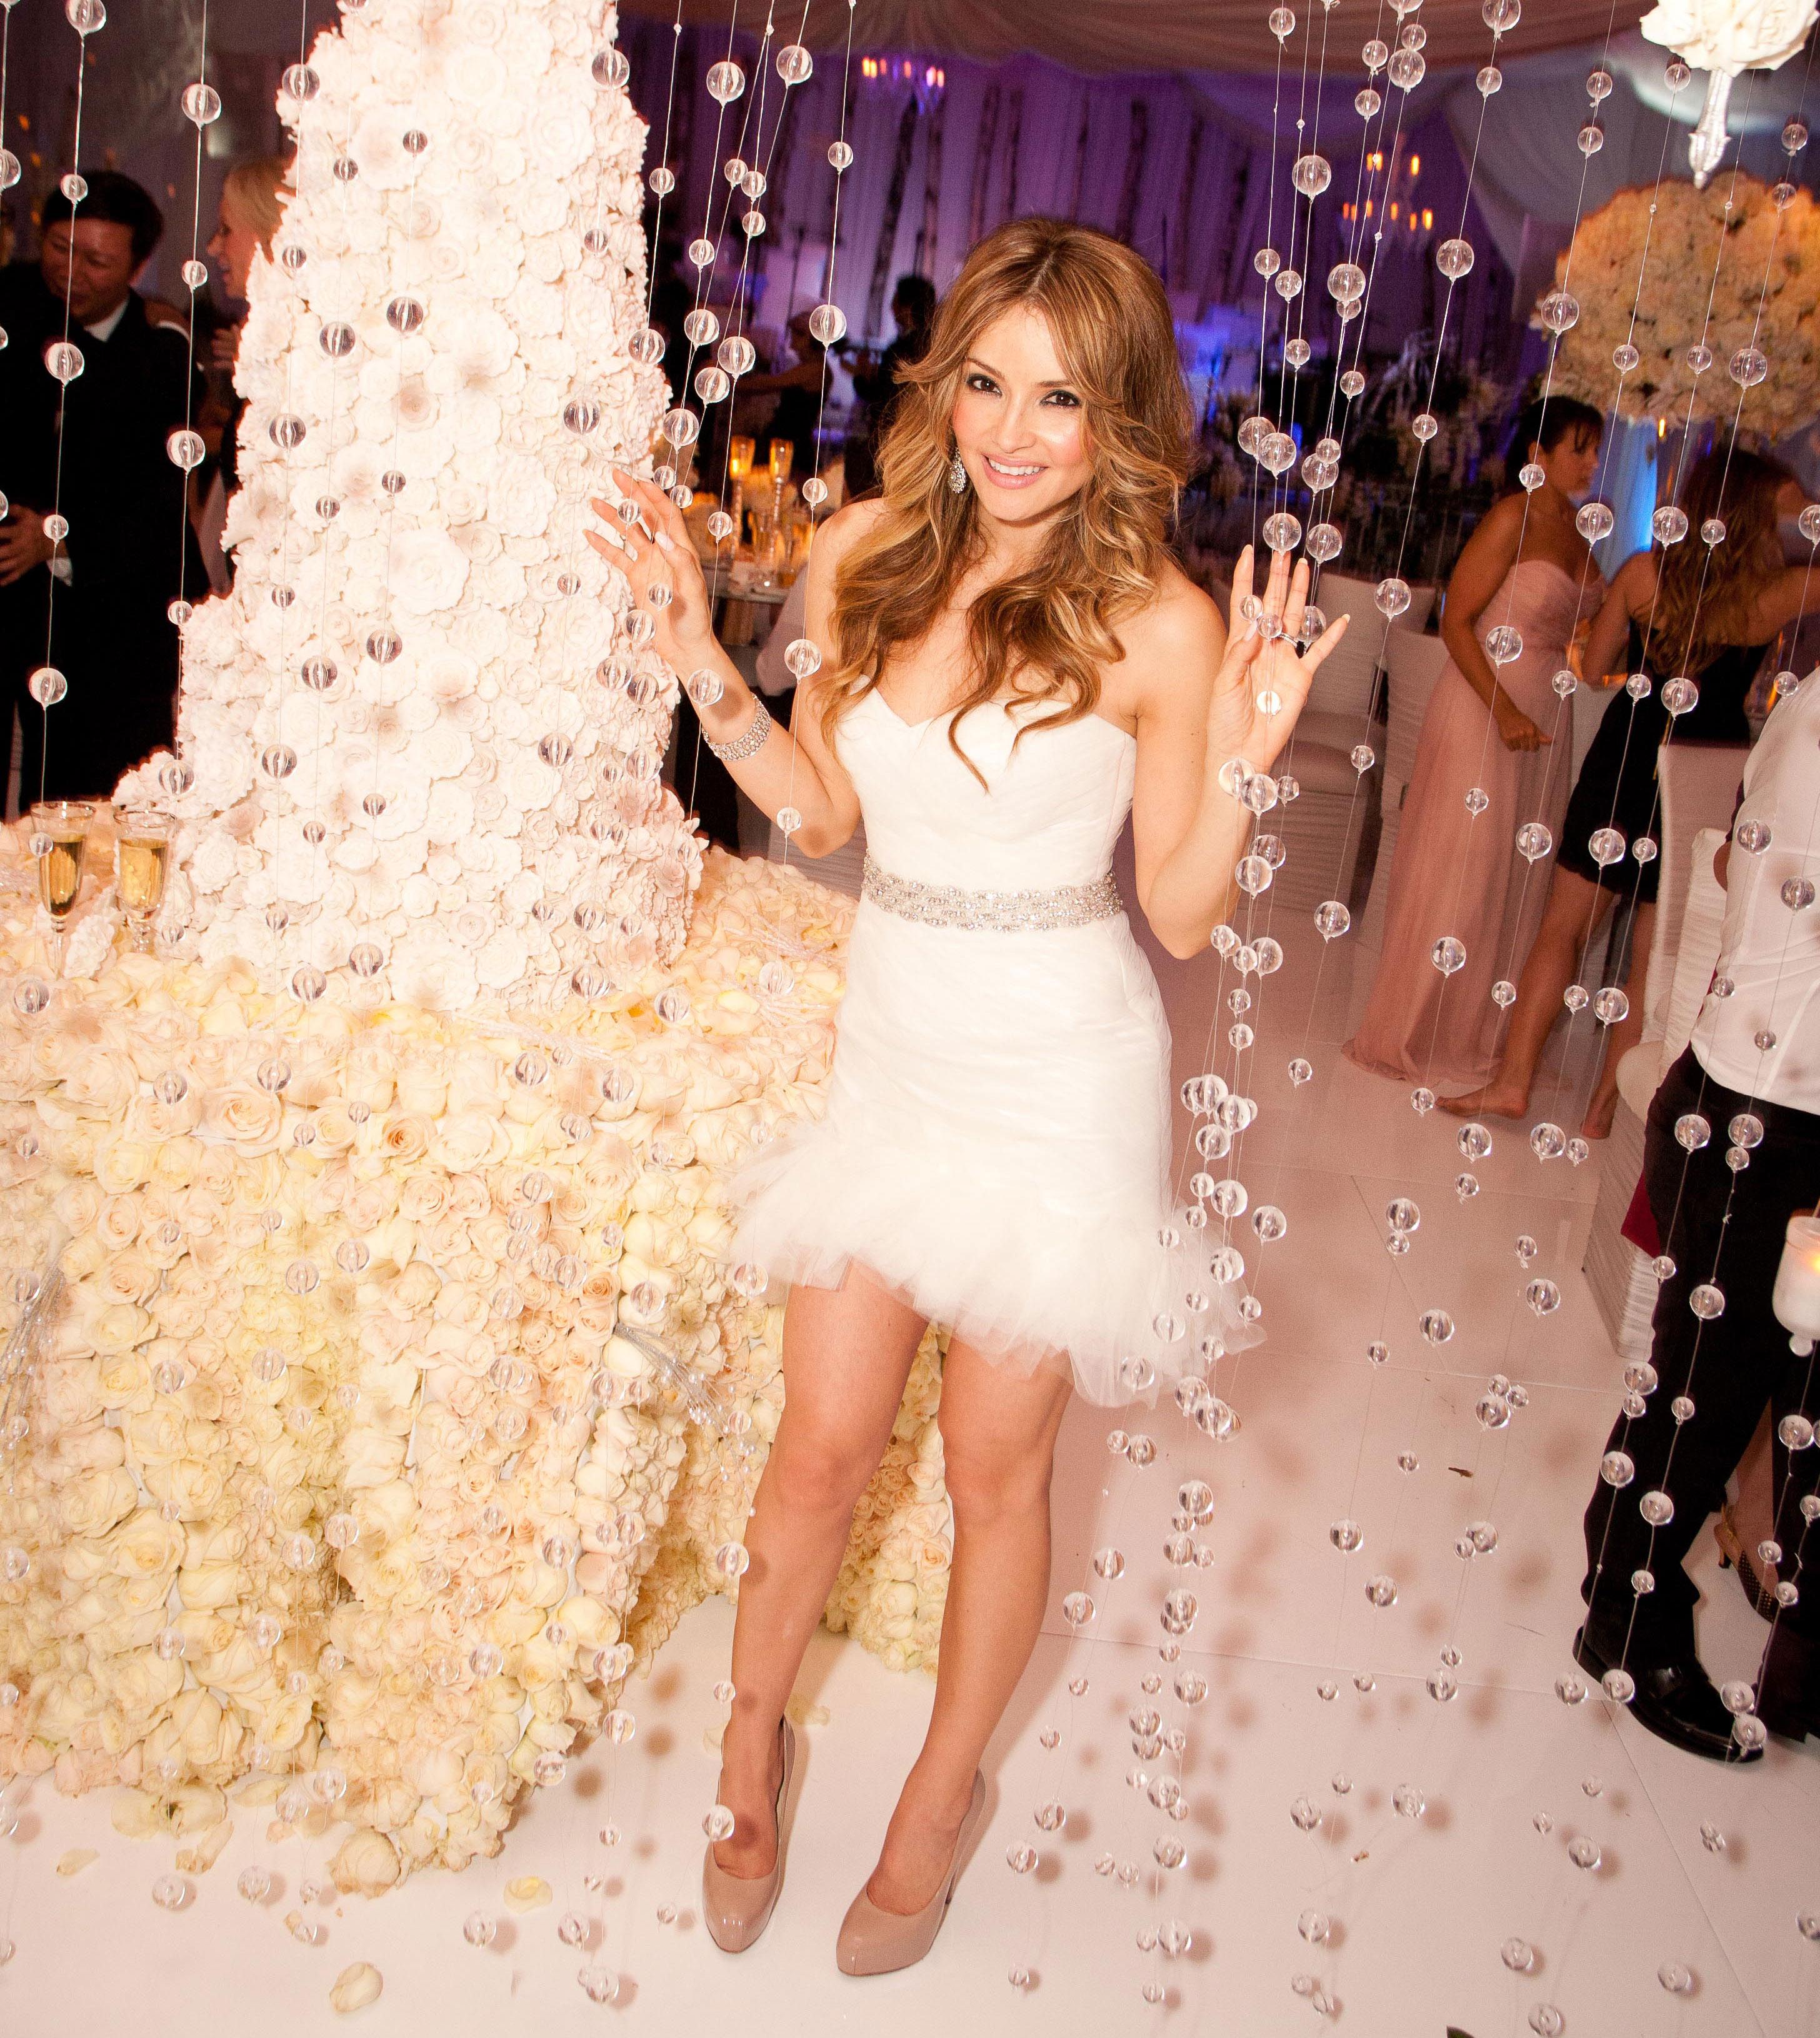 Las Vegas Wedding Venues Summer Festivals Inside Weddings